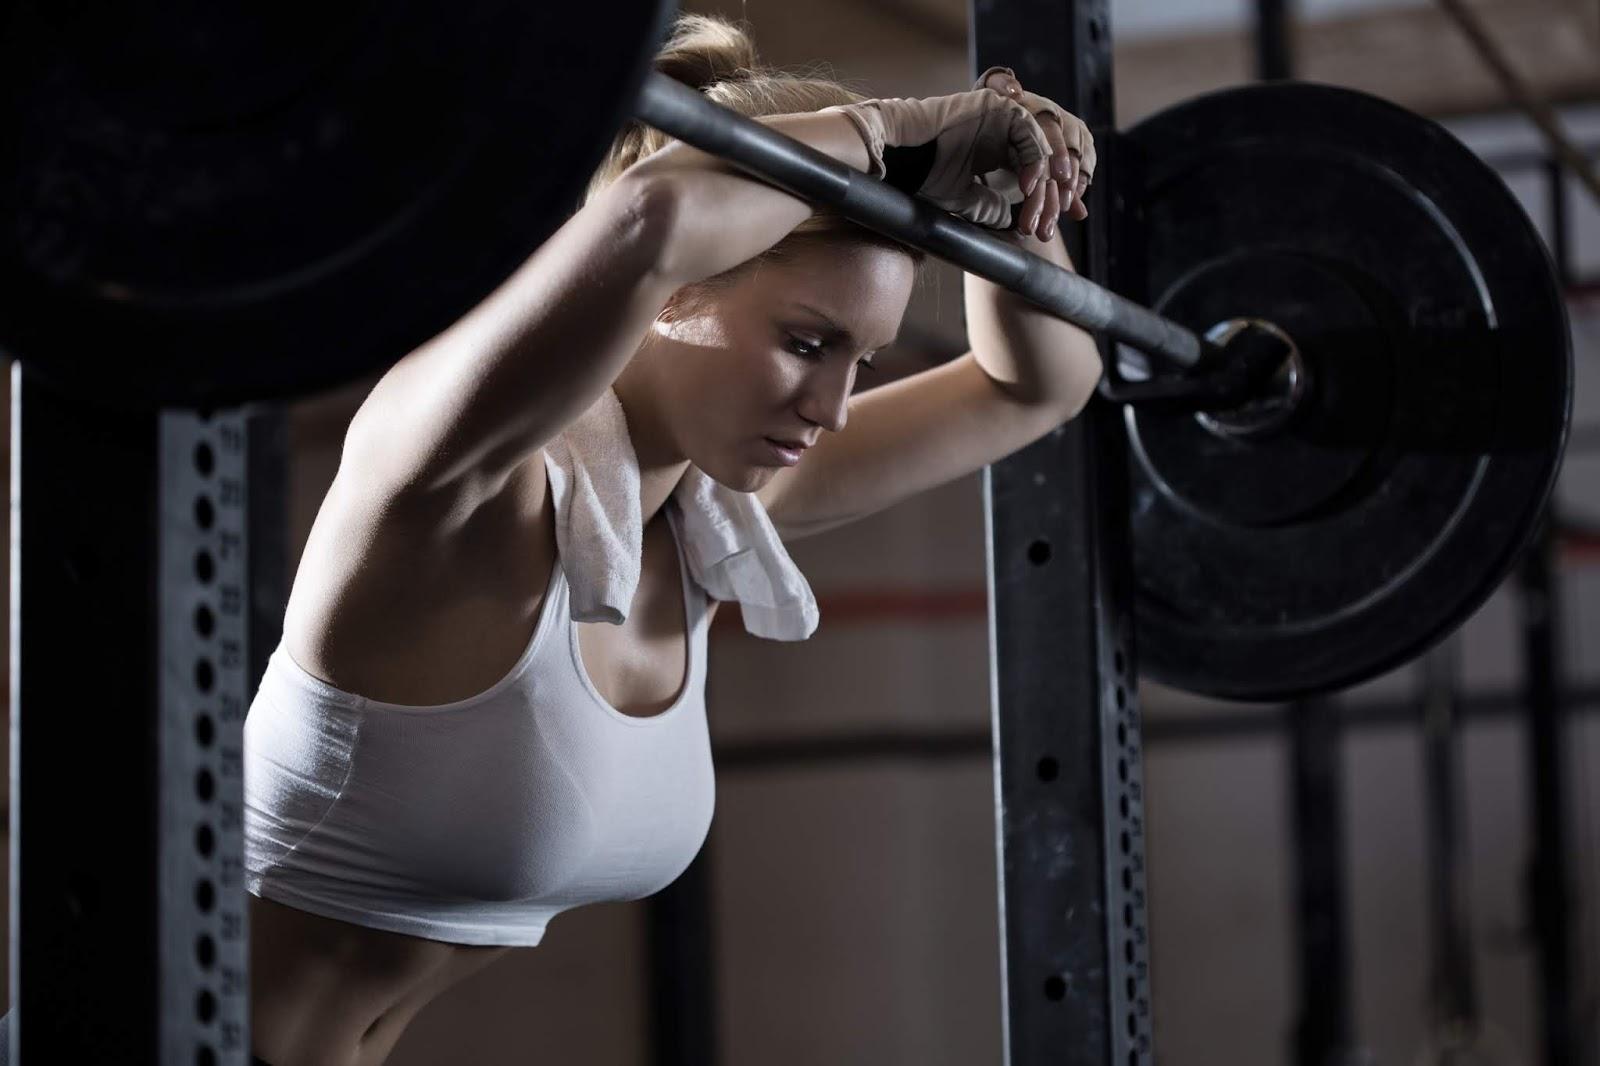 Mujer en el gimnasio, barra | Rane Forti